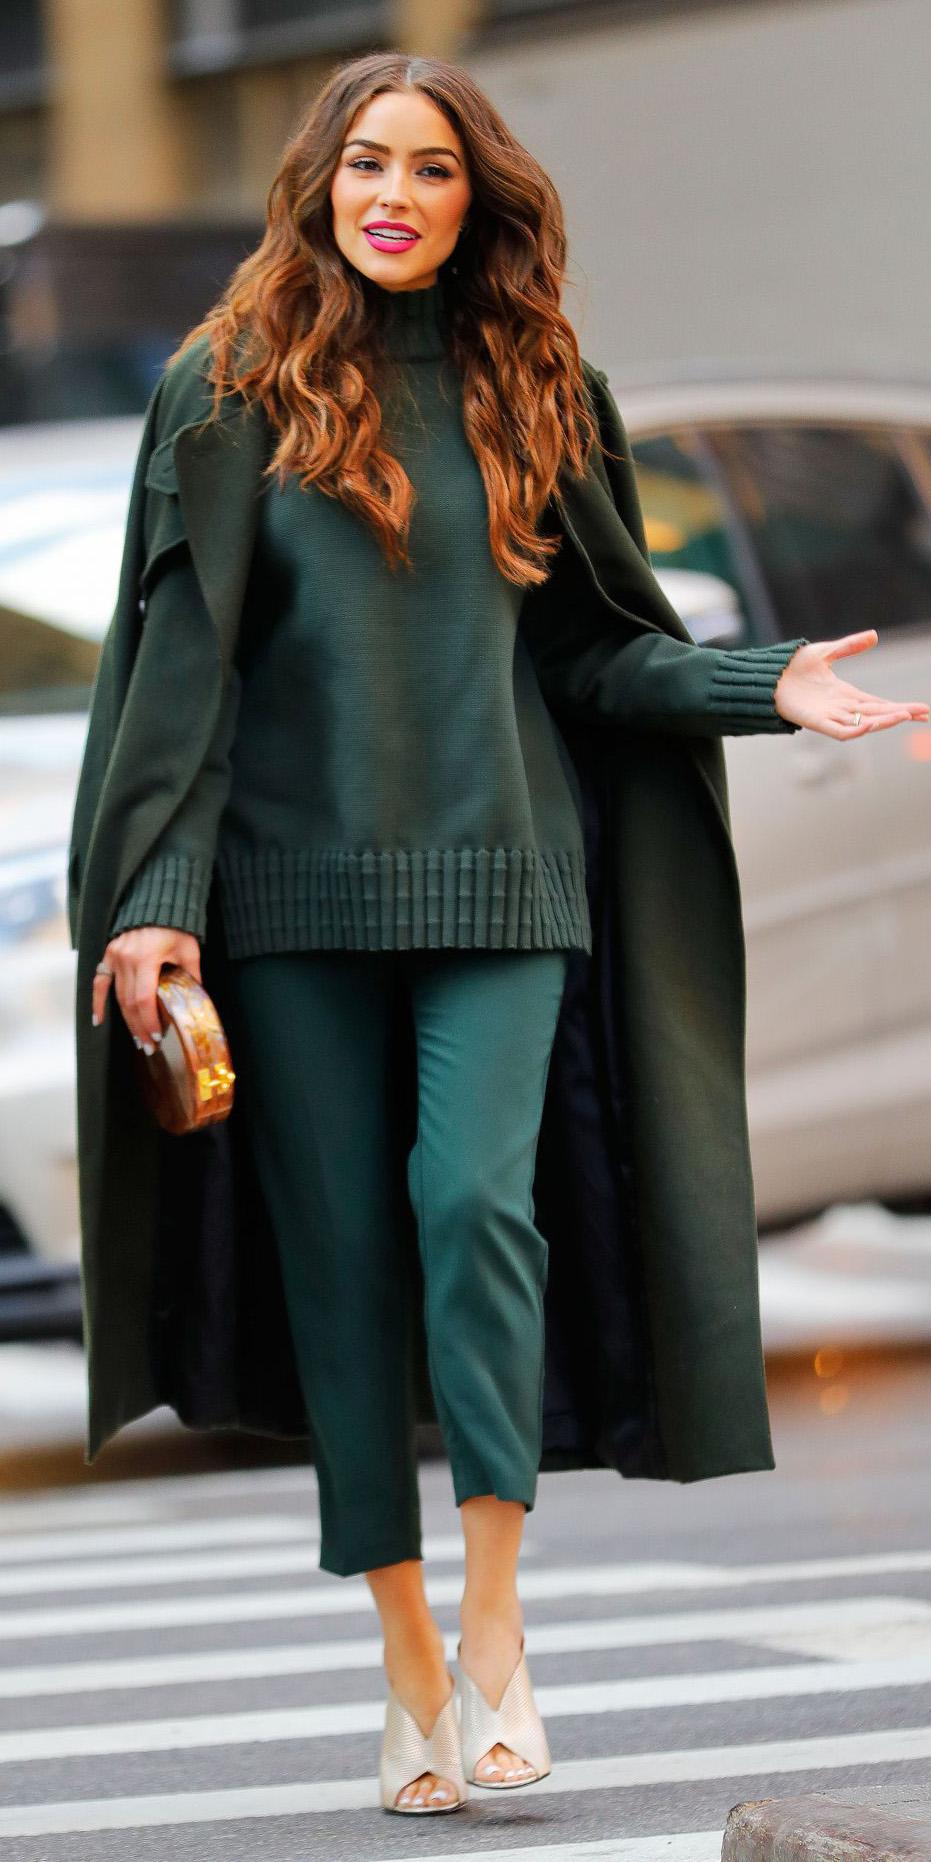 green-dark-slim-pants-green-dark-sweater-turtleneck-tan-shoe-sandalh-green-dark-jacket-coat-mono-oliviaculpo-newyork-howtowear-fashion-style-outfit-fall-winter-brun-dinner.jpg